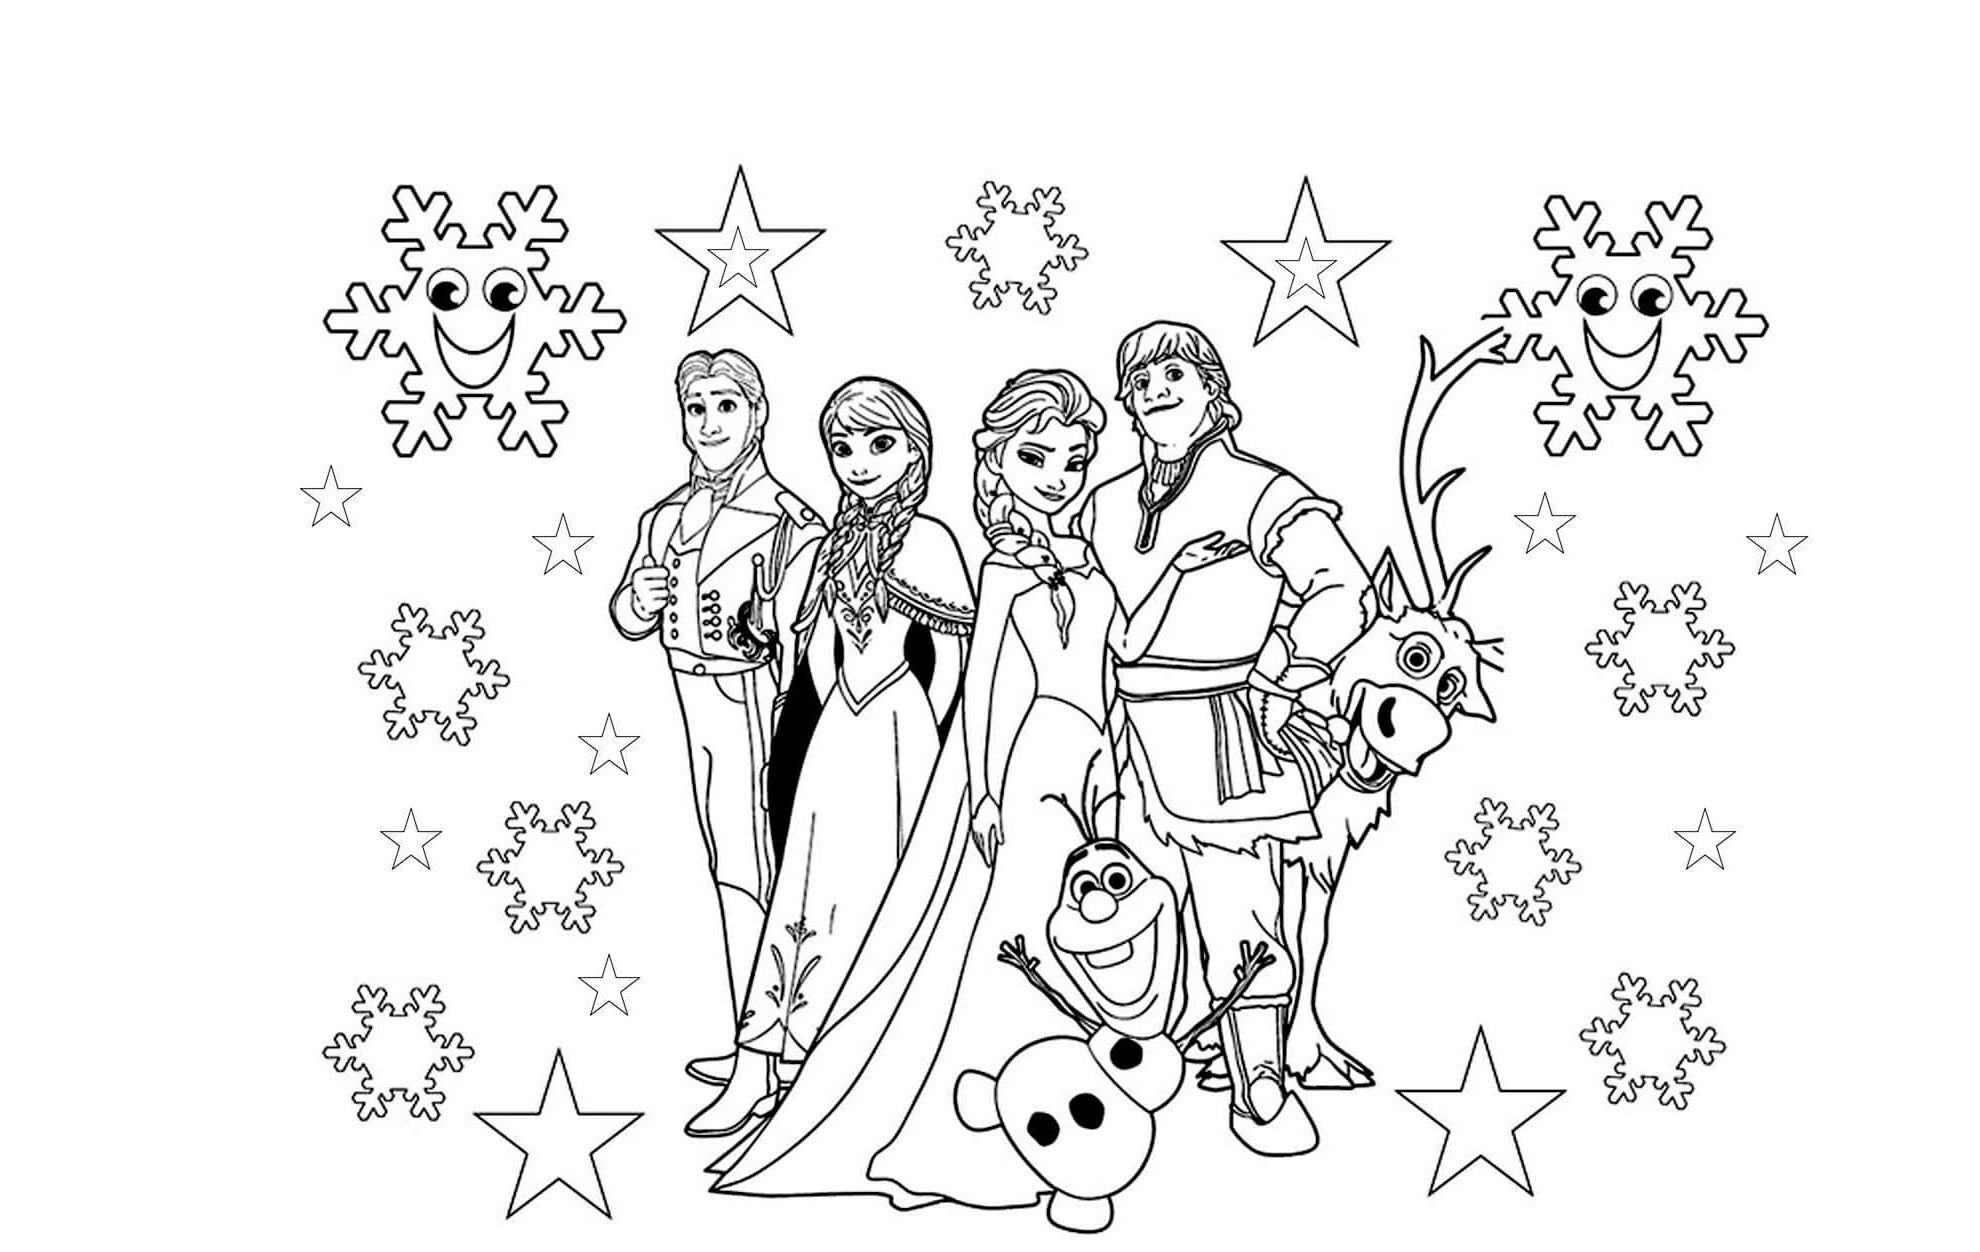 Ausmalbilder Frozen Disney E1551072507160 Ausmalbilder Elsa Ausmalbild Ausmalbilder Anna Und Elsa